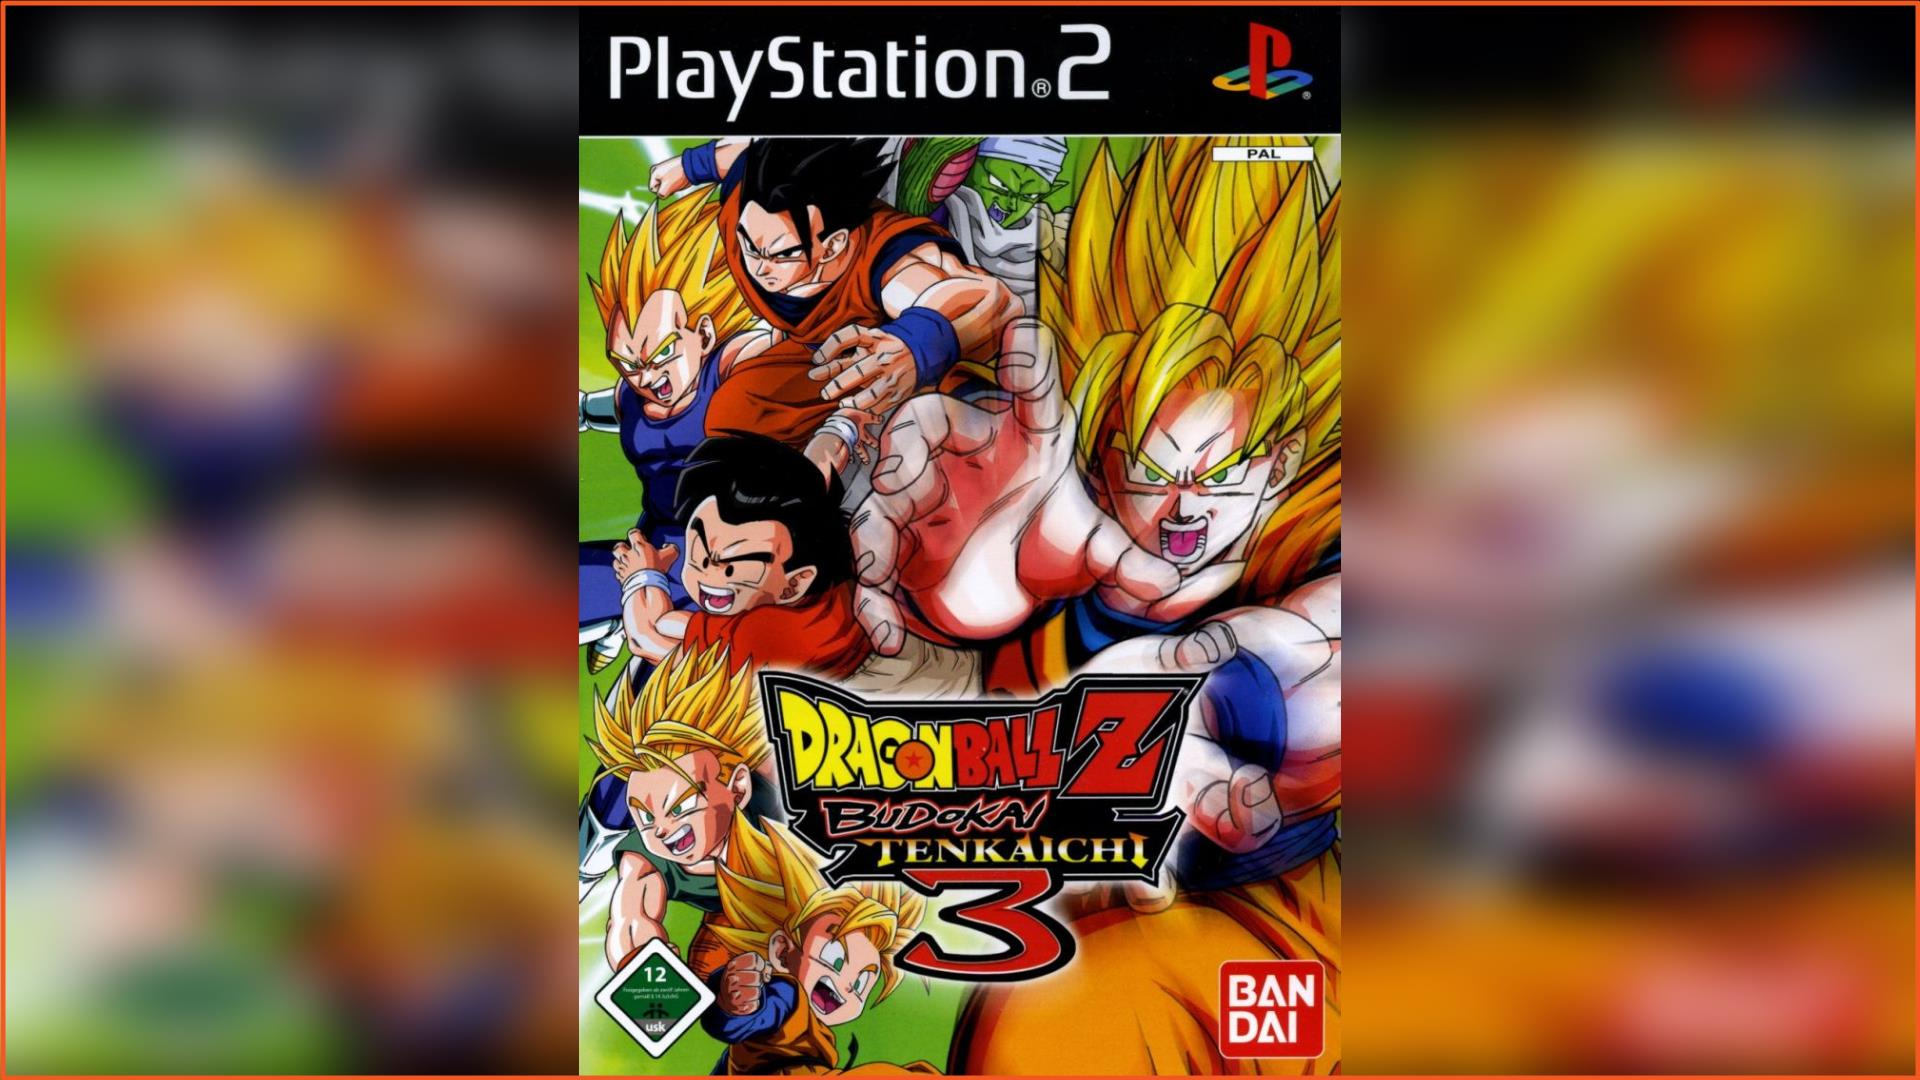 Dragon Ball Z Budokai Tenkaichi 3 PS2 ISO Download